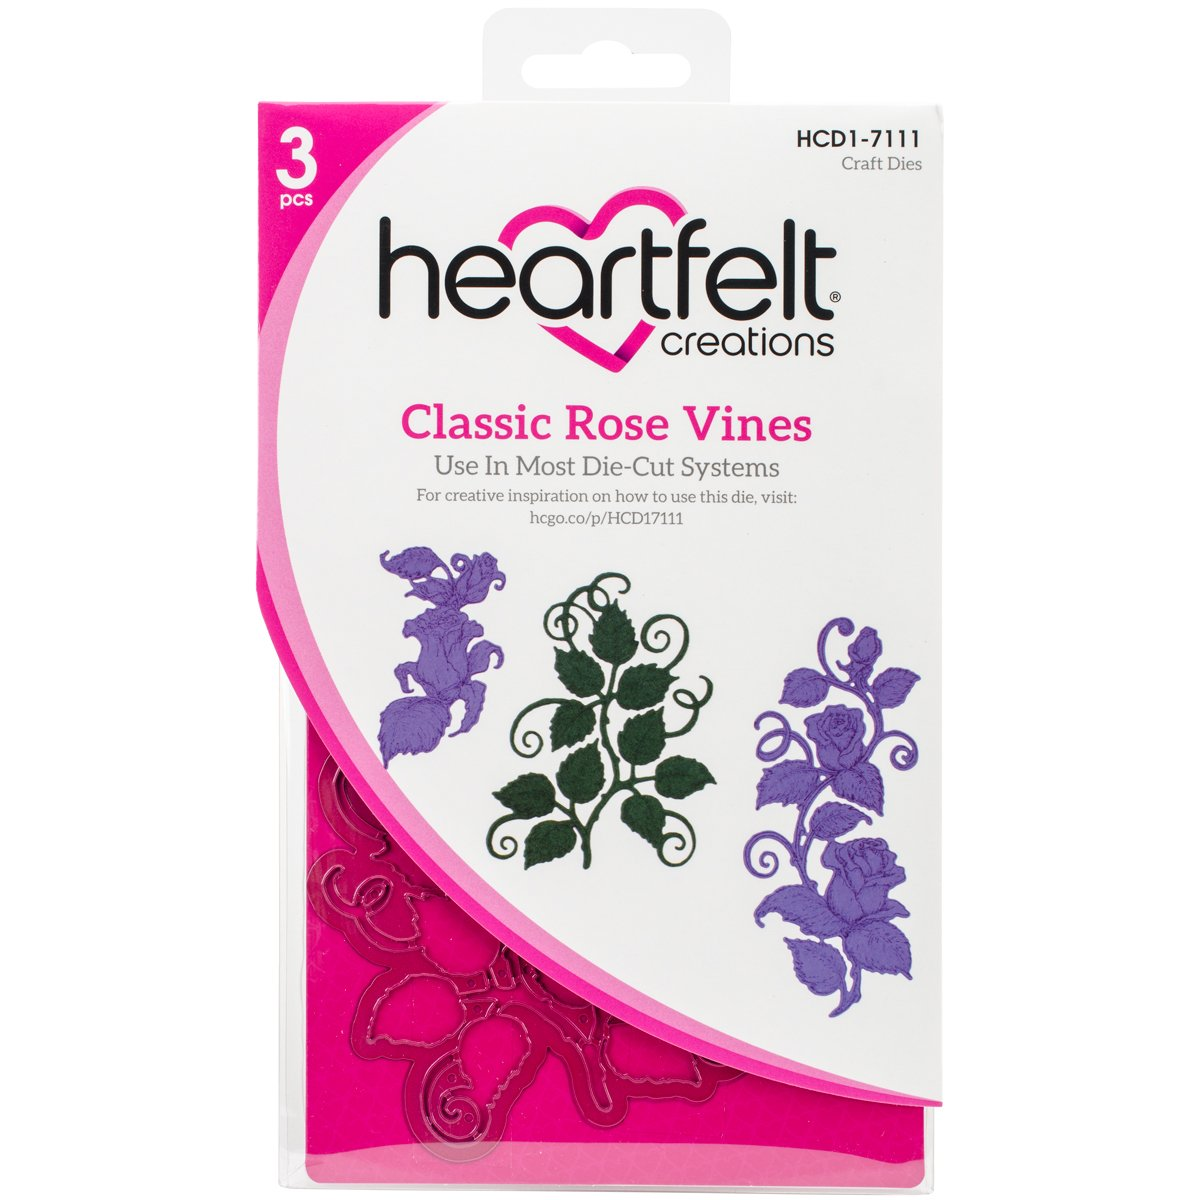 Heartfelt Creations Classic Rose Vines Die HCD17111